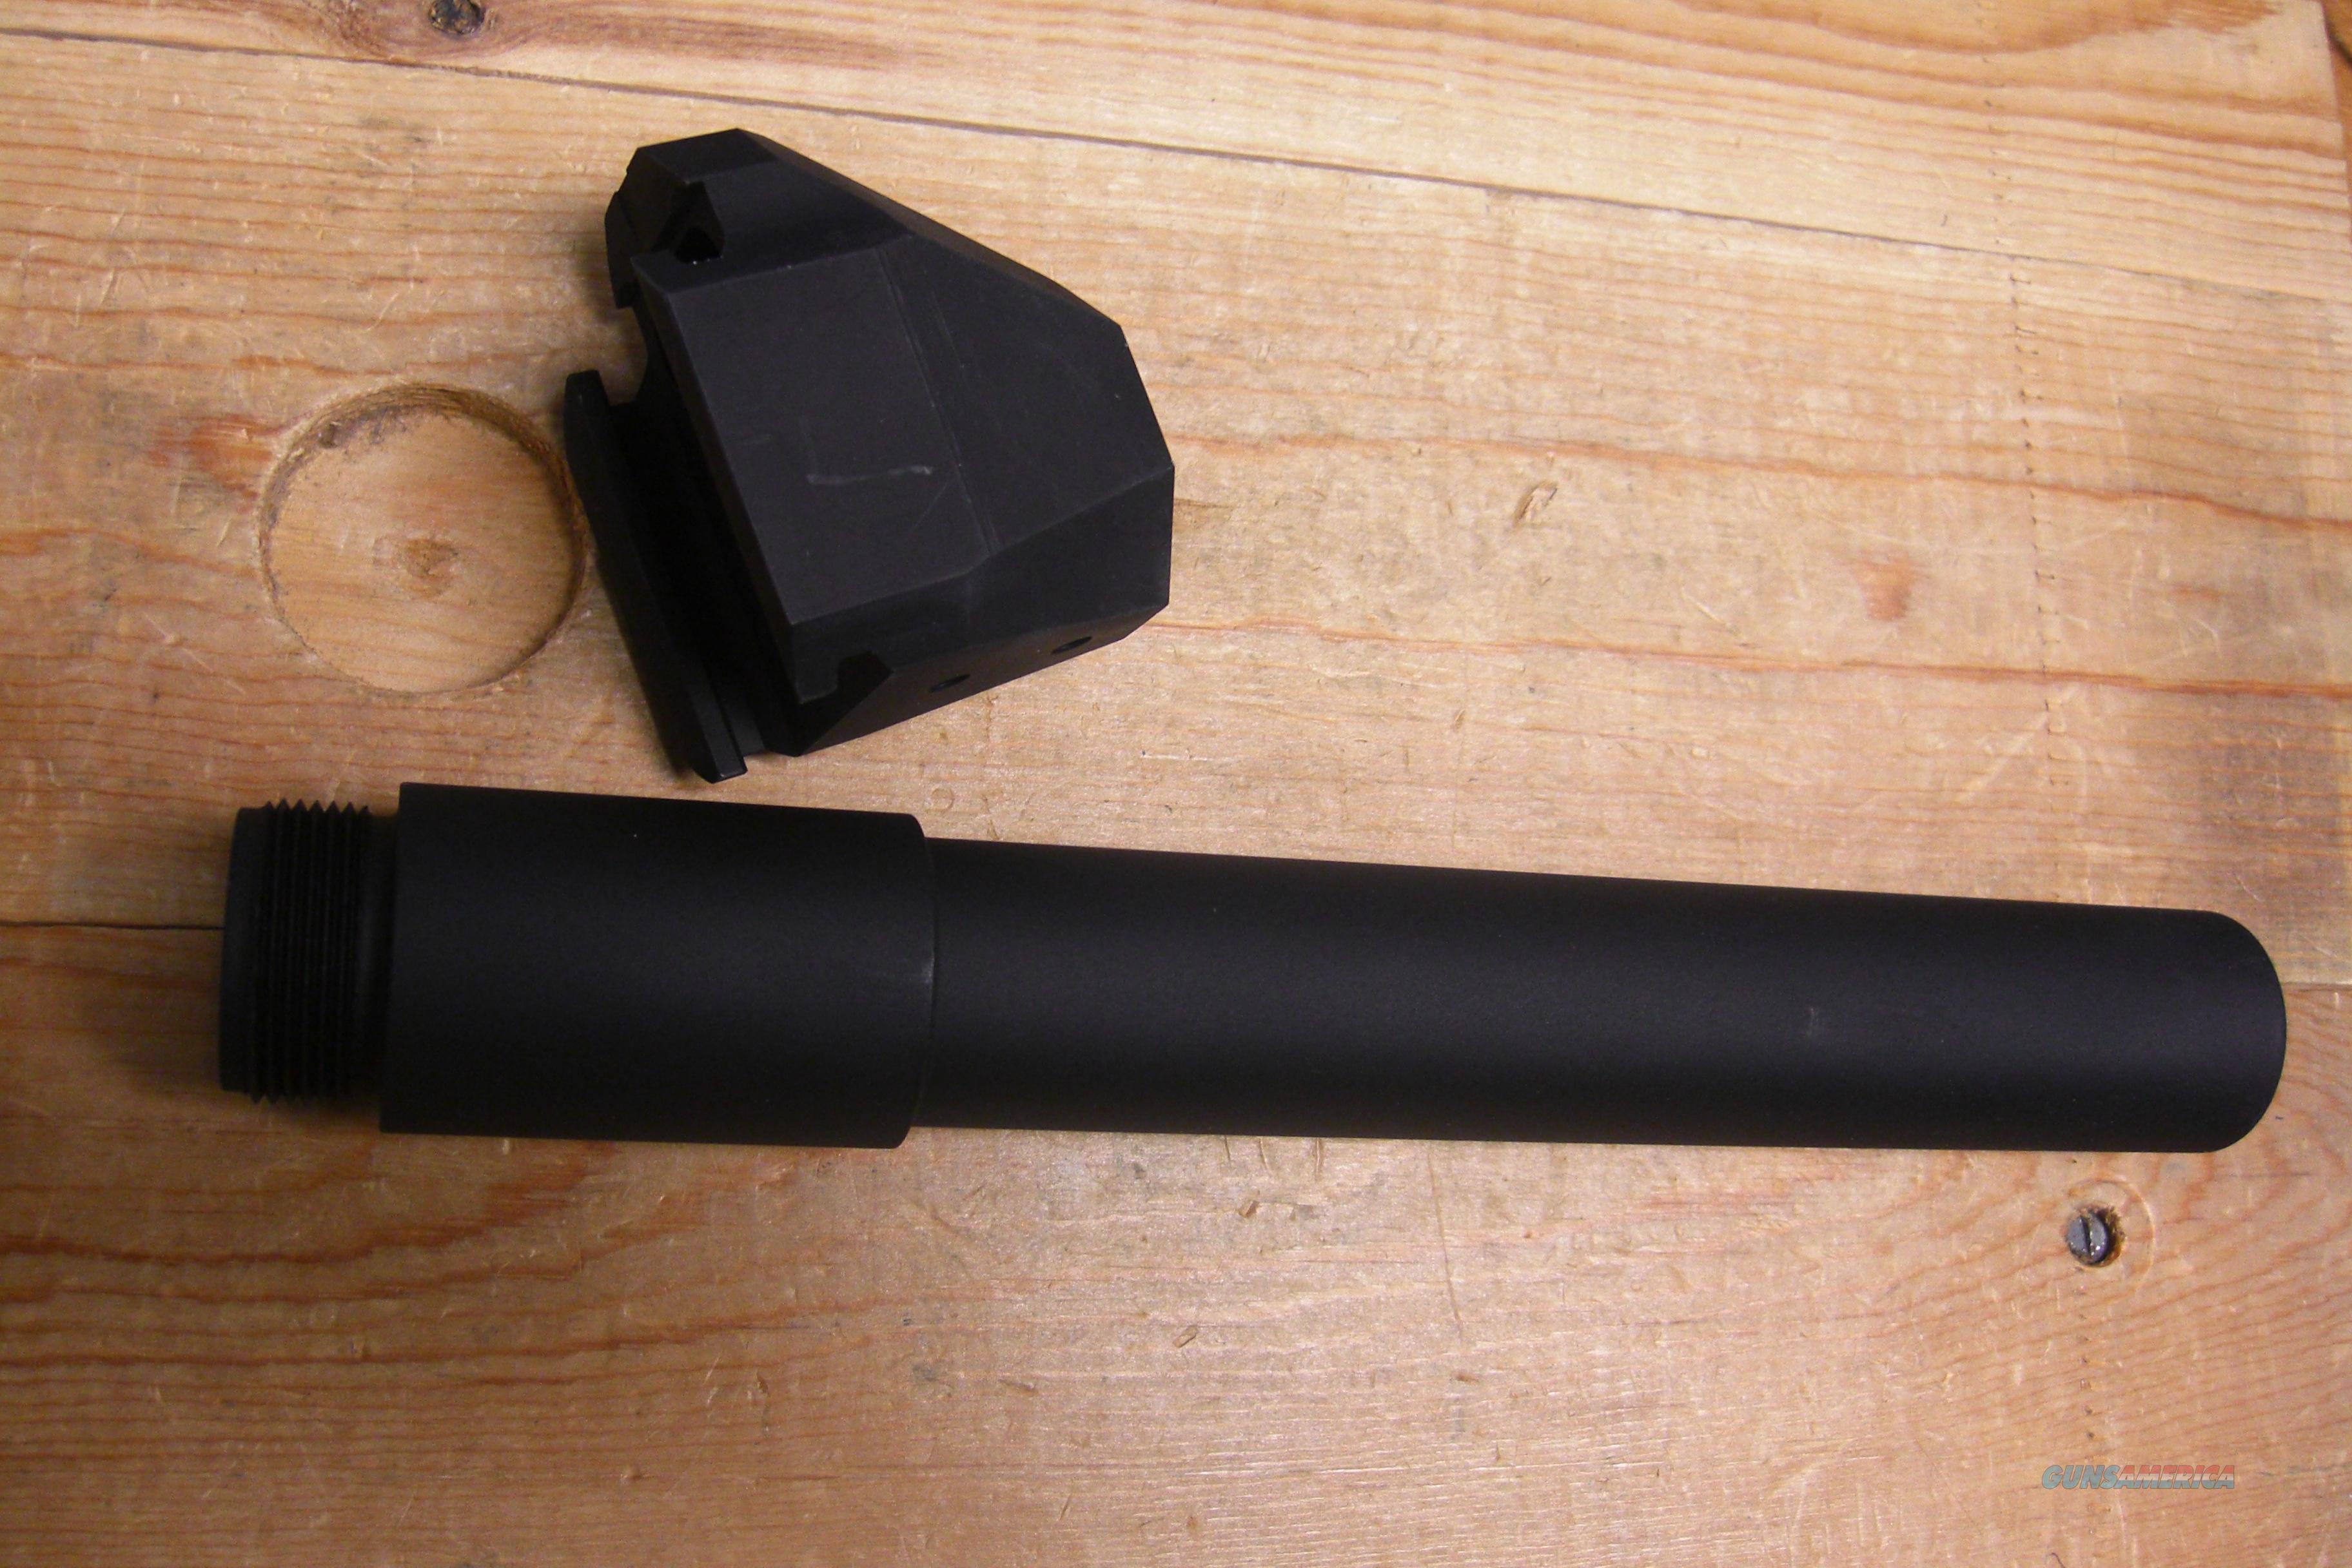 CZ Scorpion EVO 3 S1 pistol arm brace kit